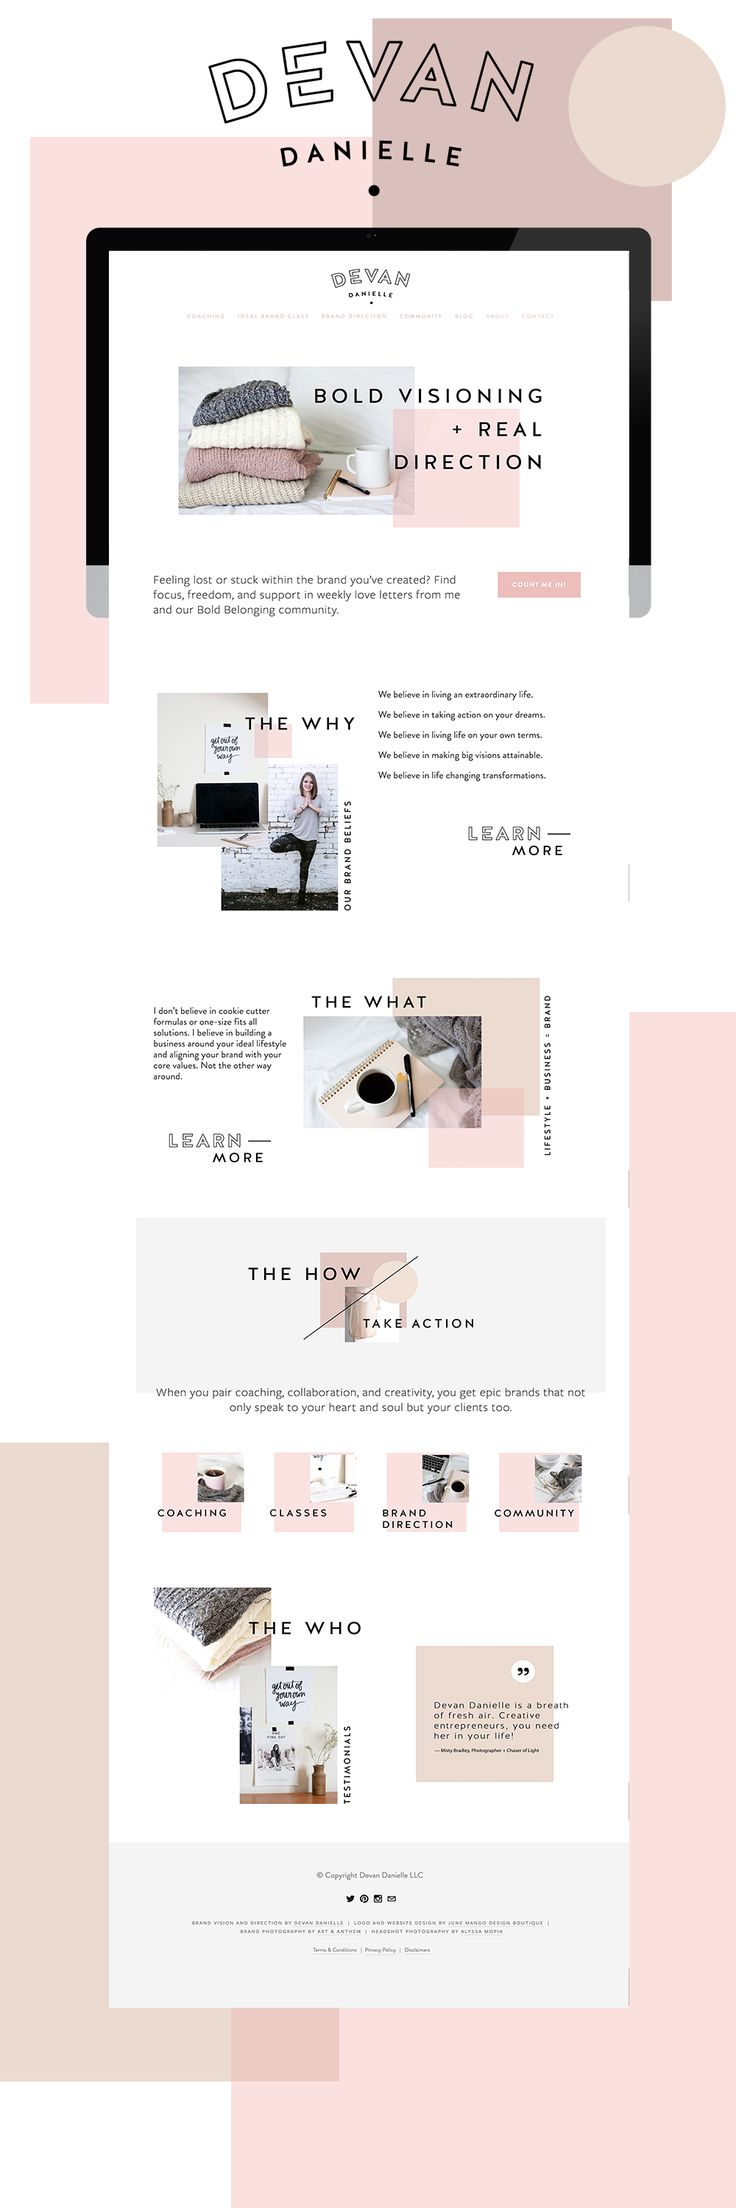 Devan Danielle Branding + Go Live in 5 Web Design — June Mango Design Boutique